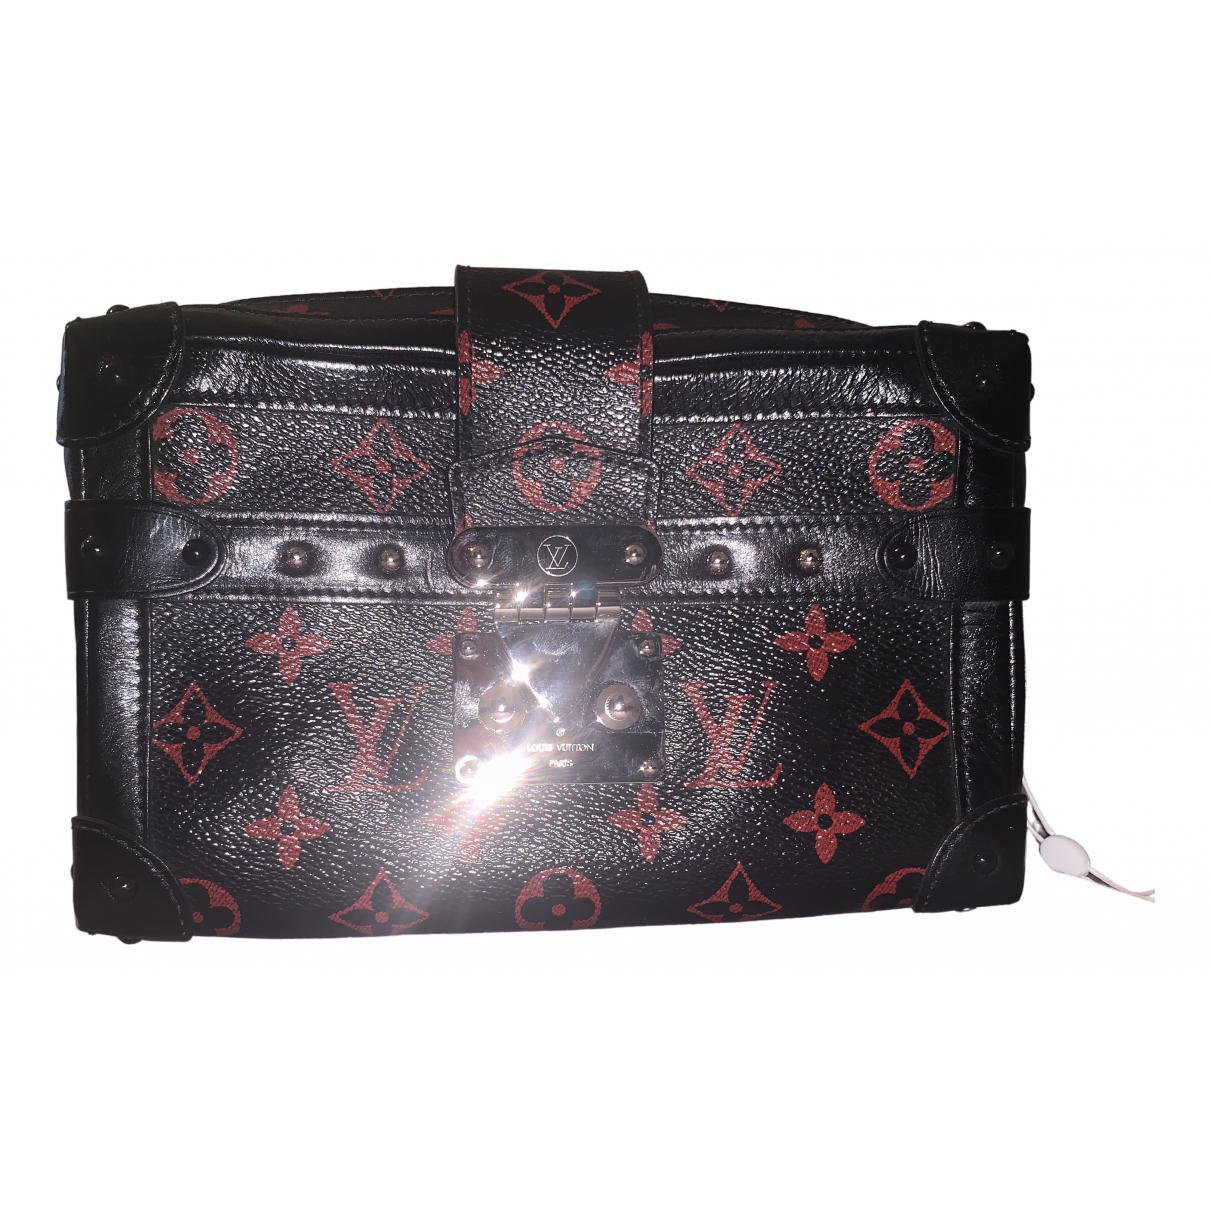 Louis Vuitton Malle Trunk Black Cloth bag for Men \N